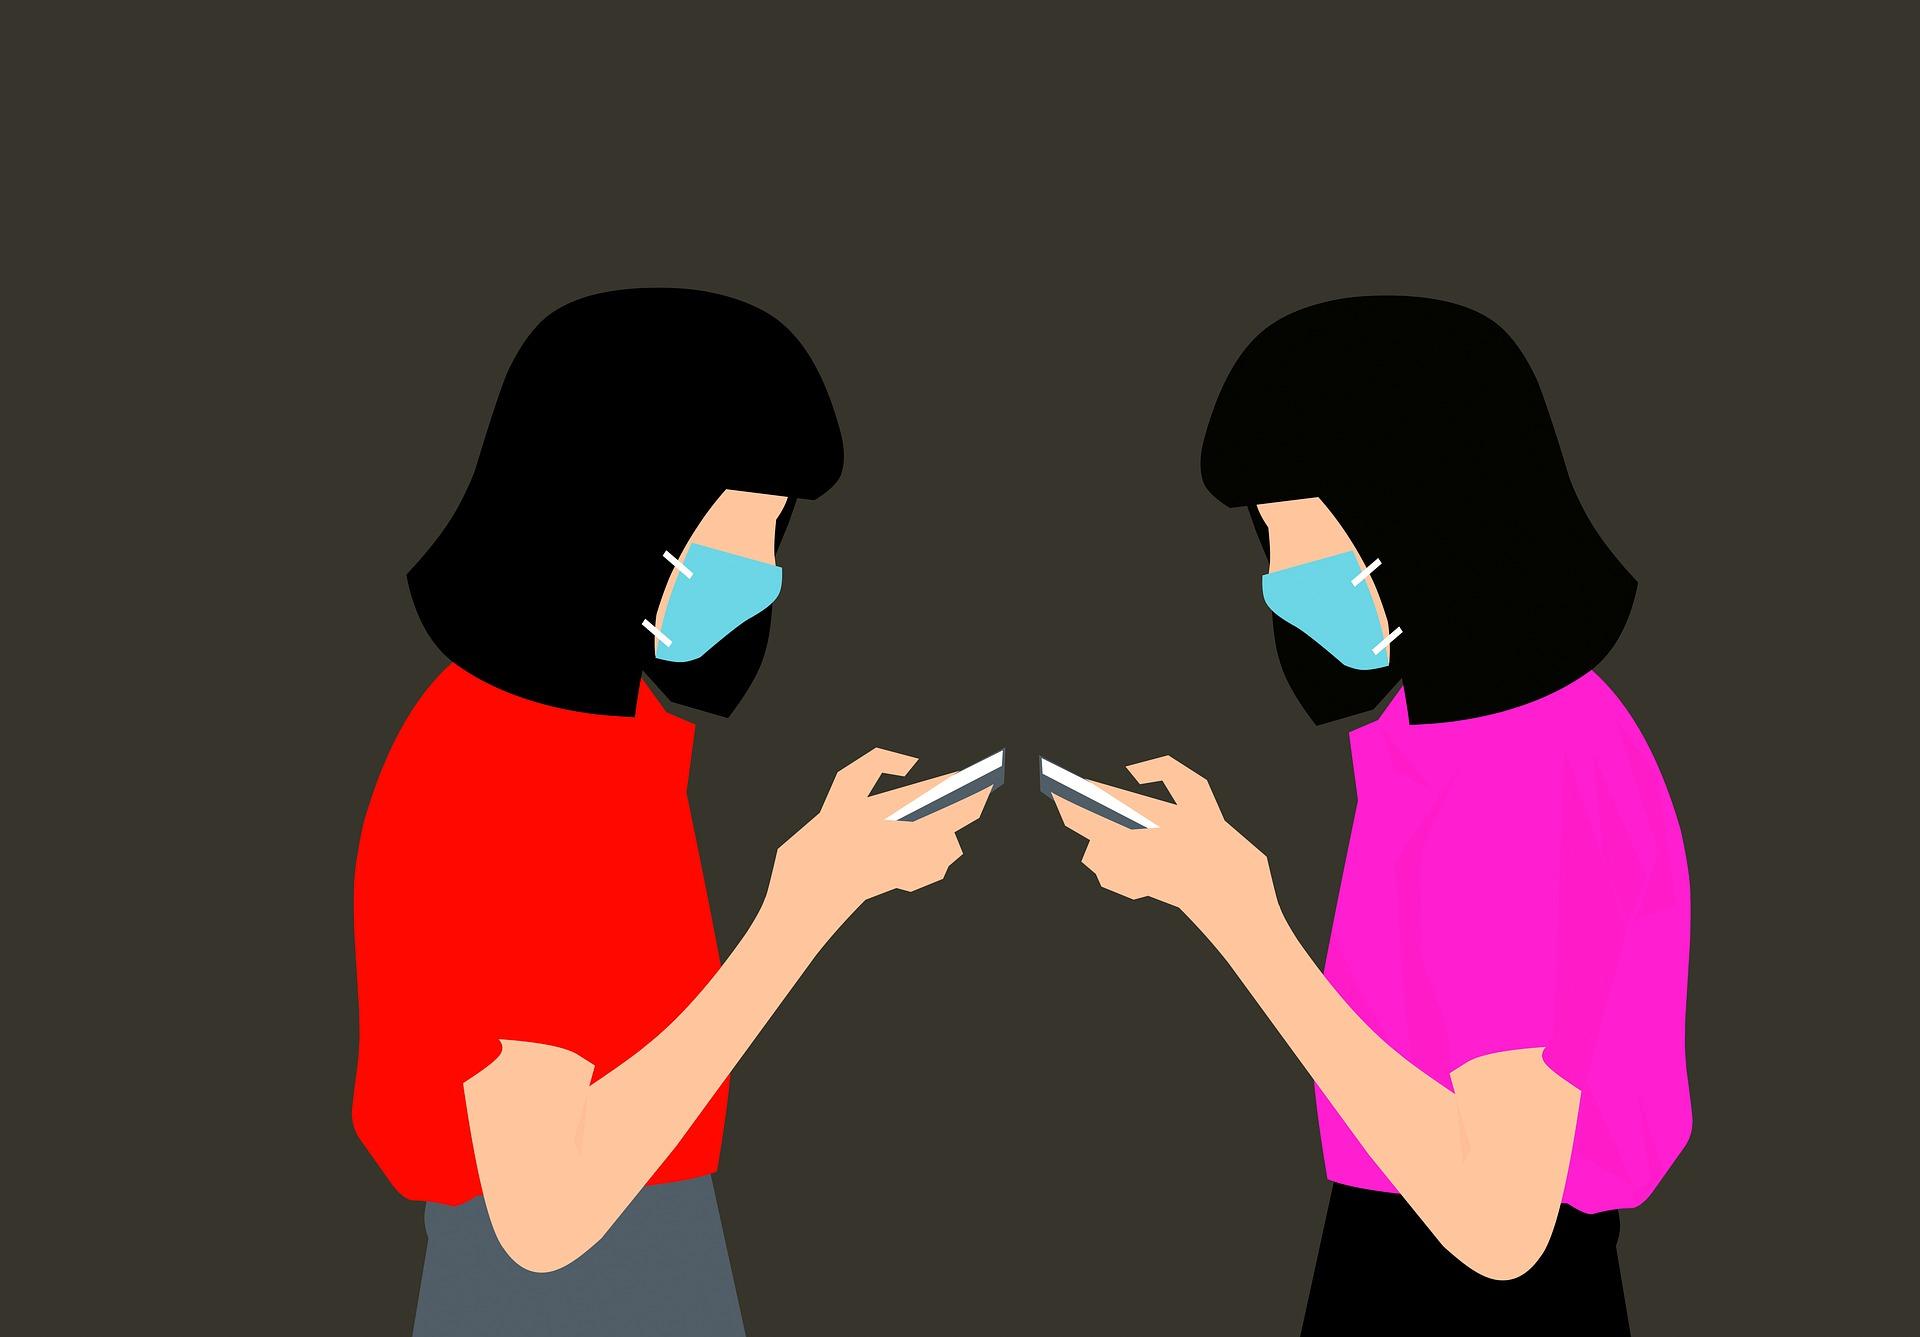 Apotheke Digitalisierung AI KI Pandemie COVID-19 Coronavirus